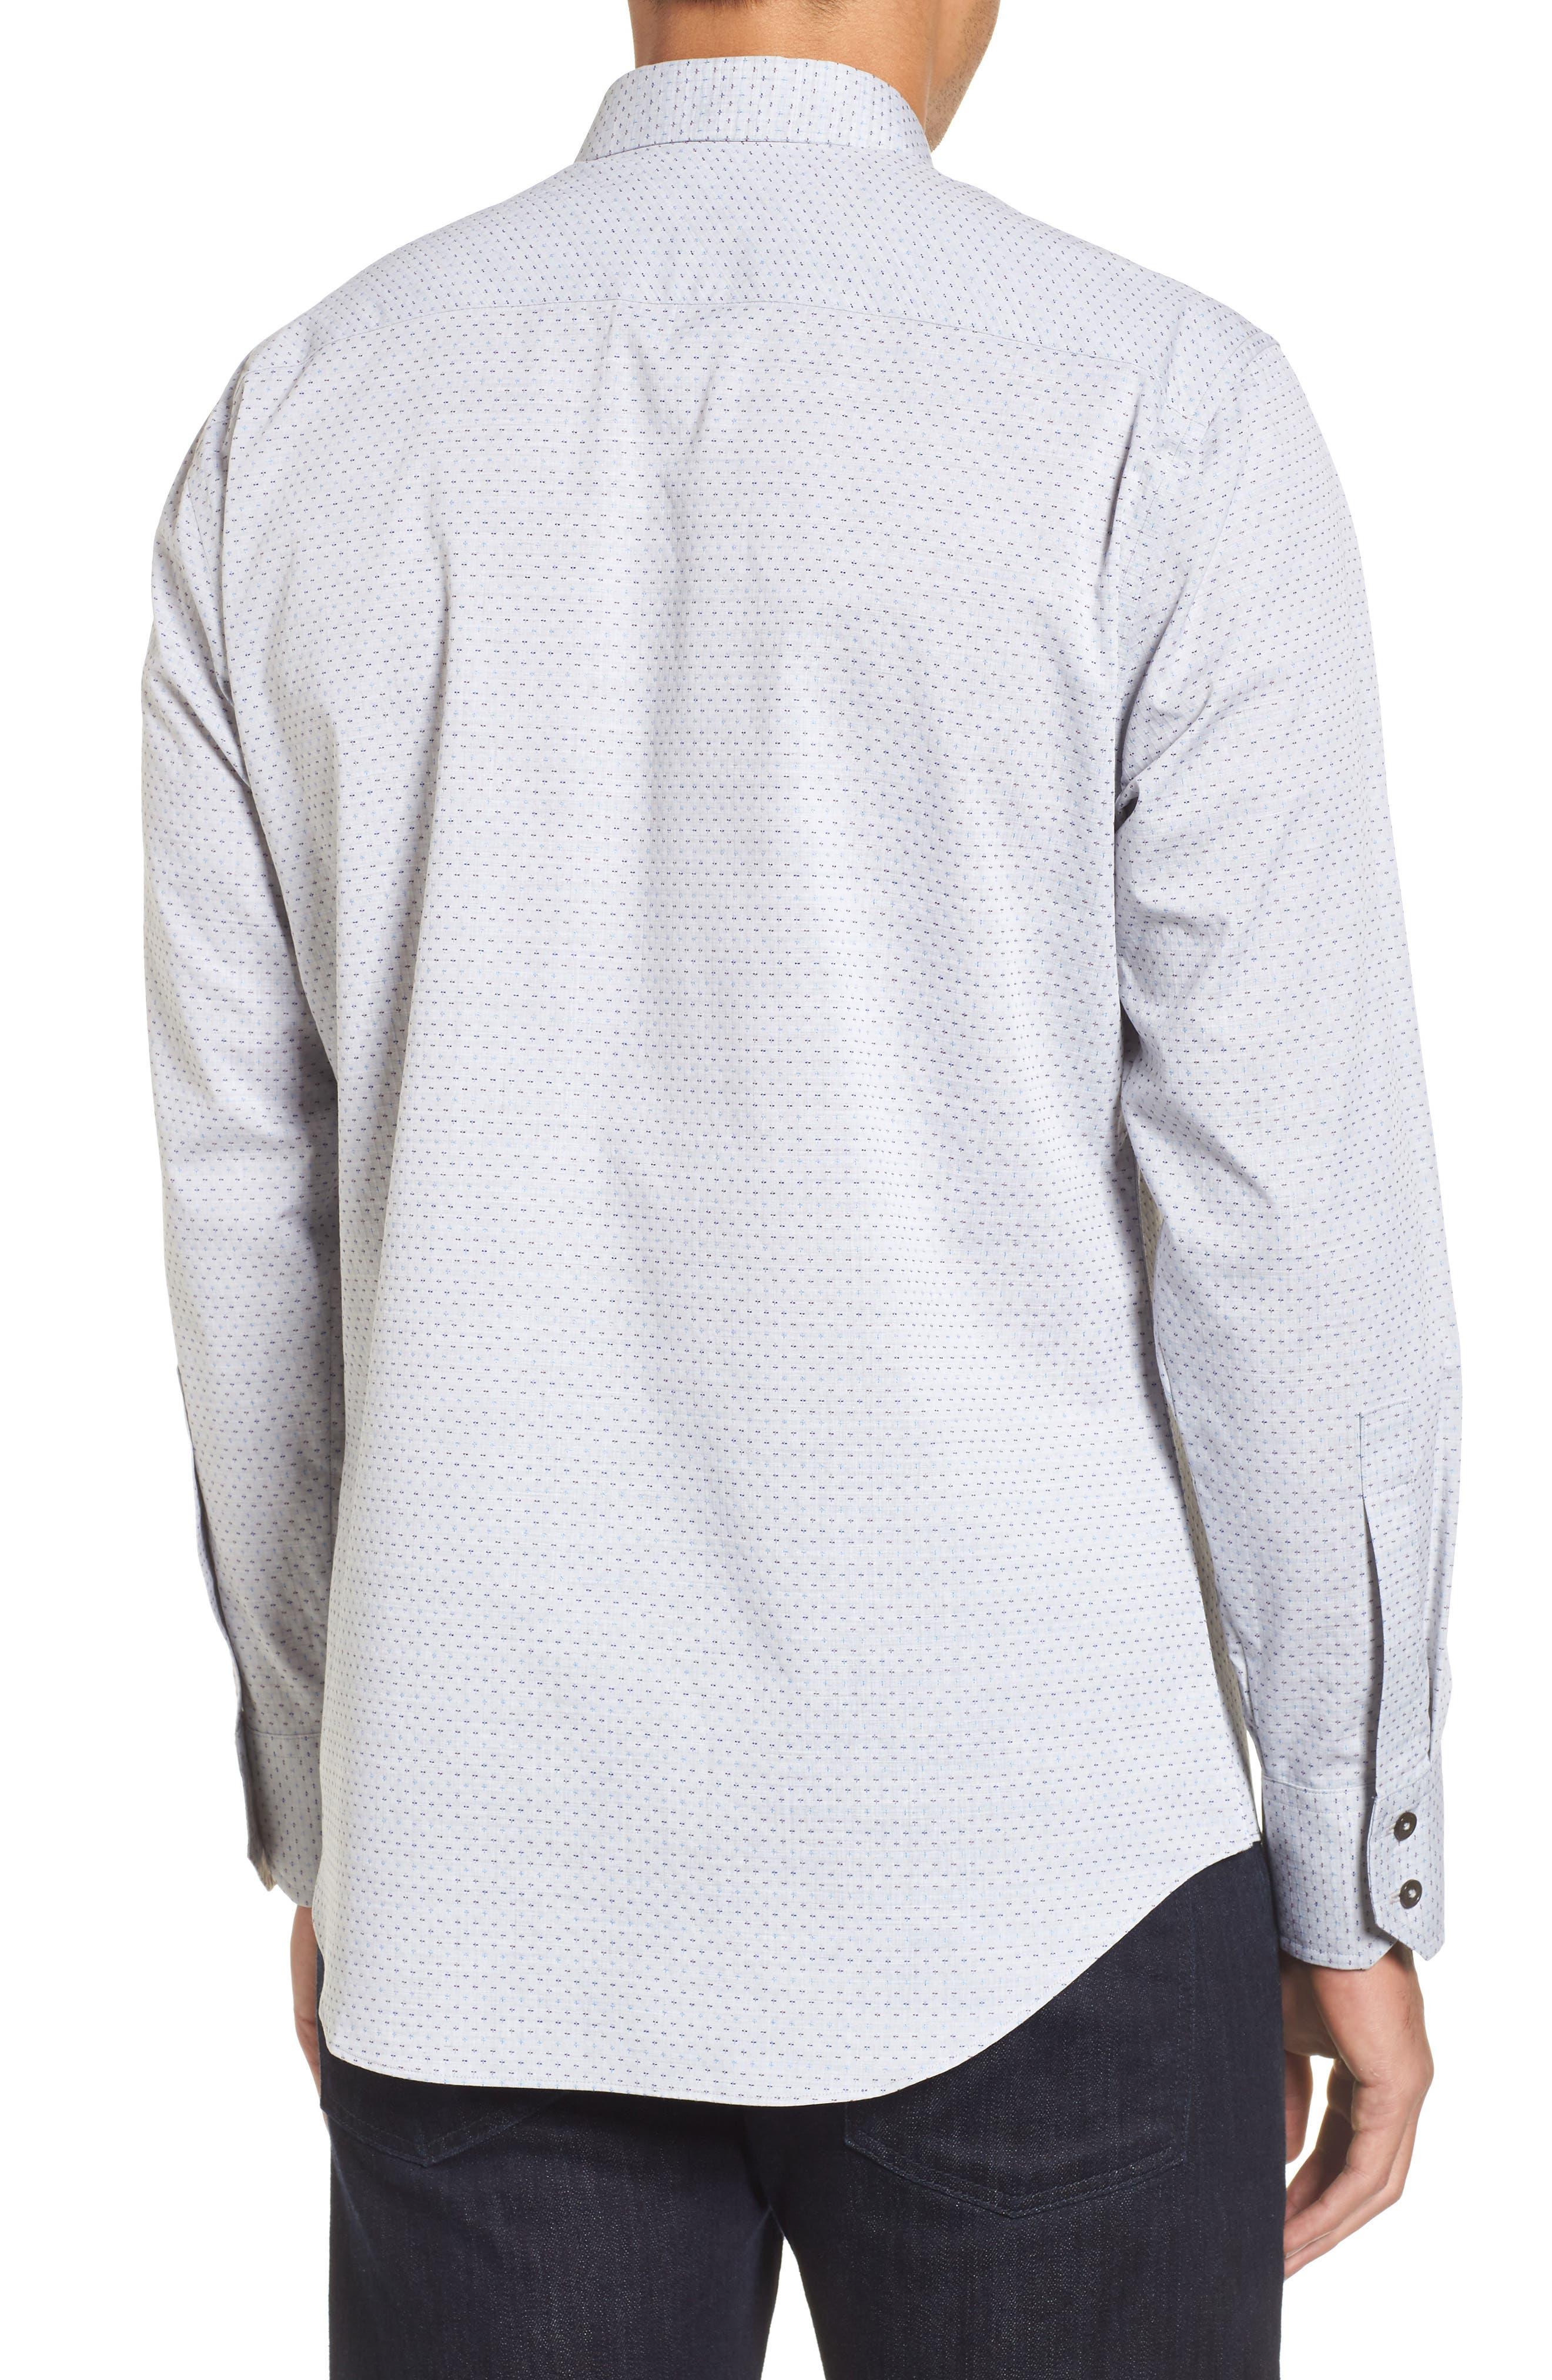 Atila Slim Fit Dobby Woven Sport Shirt,                             Alternate thumbnail 2, color,                             050